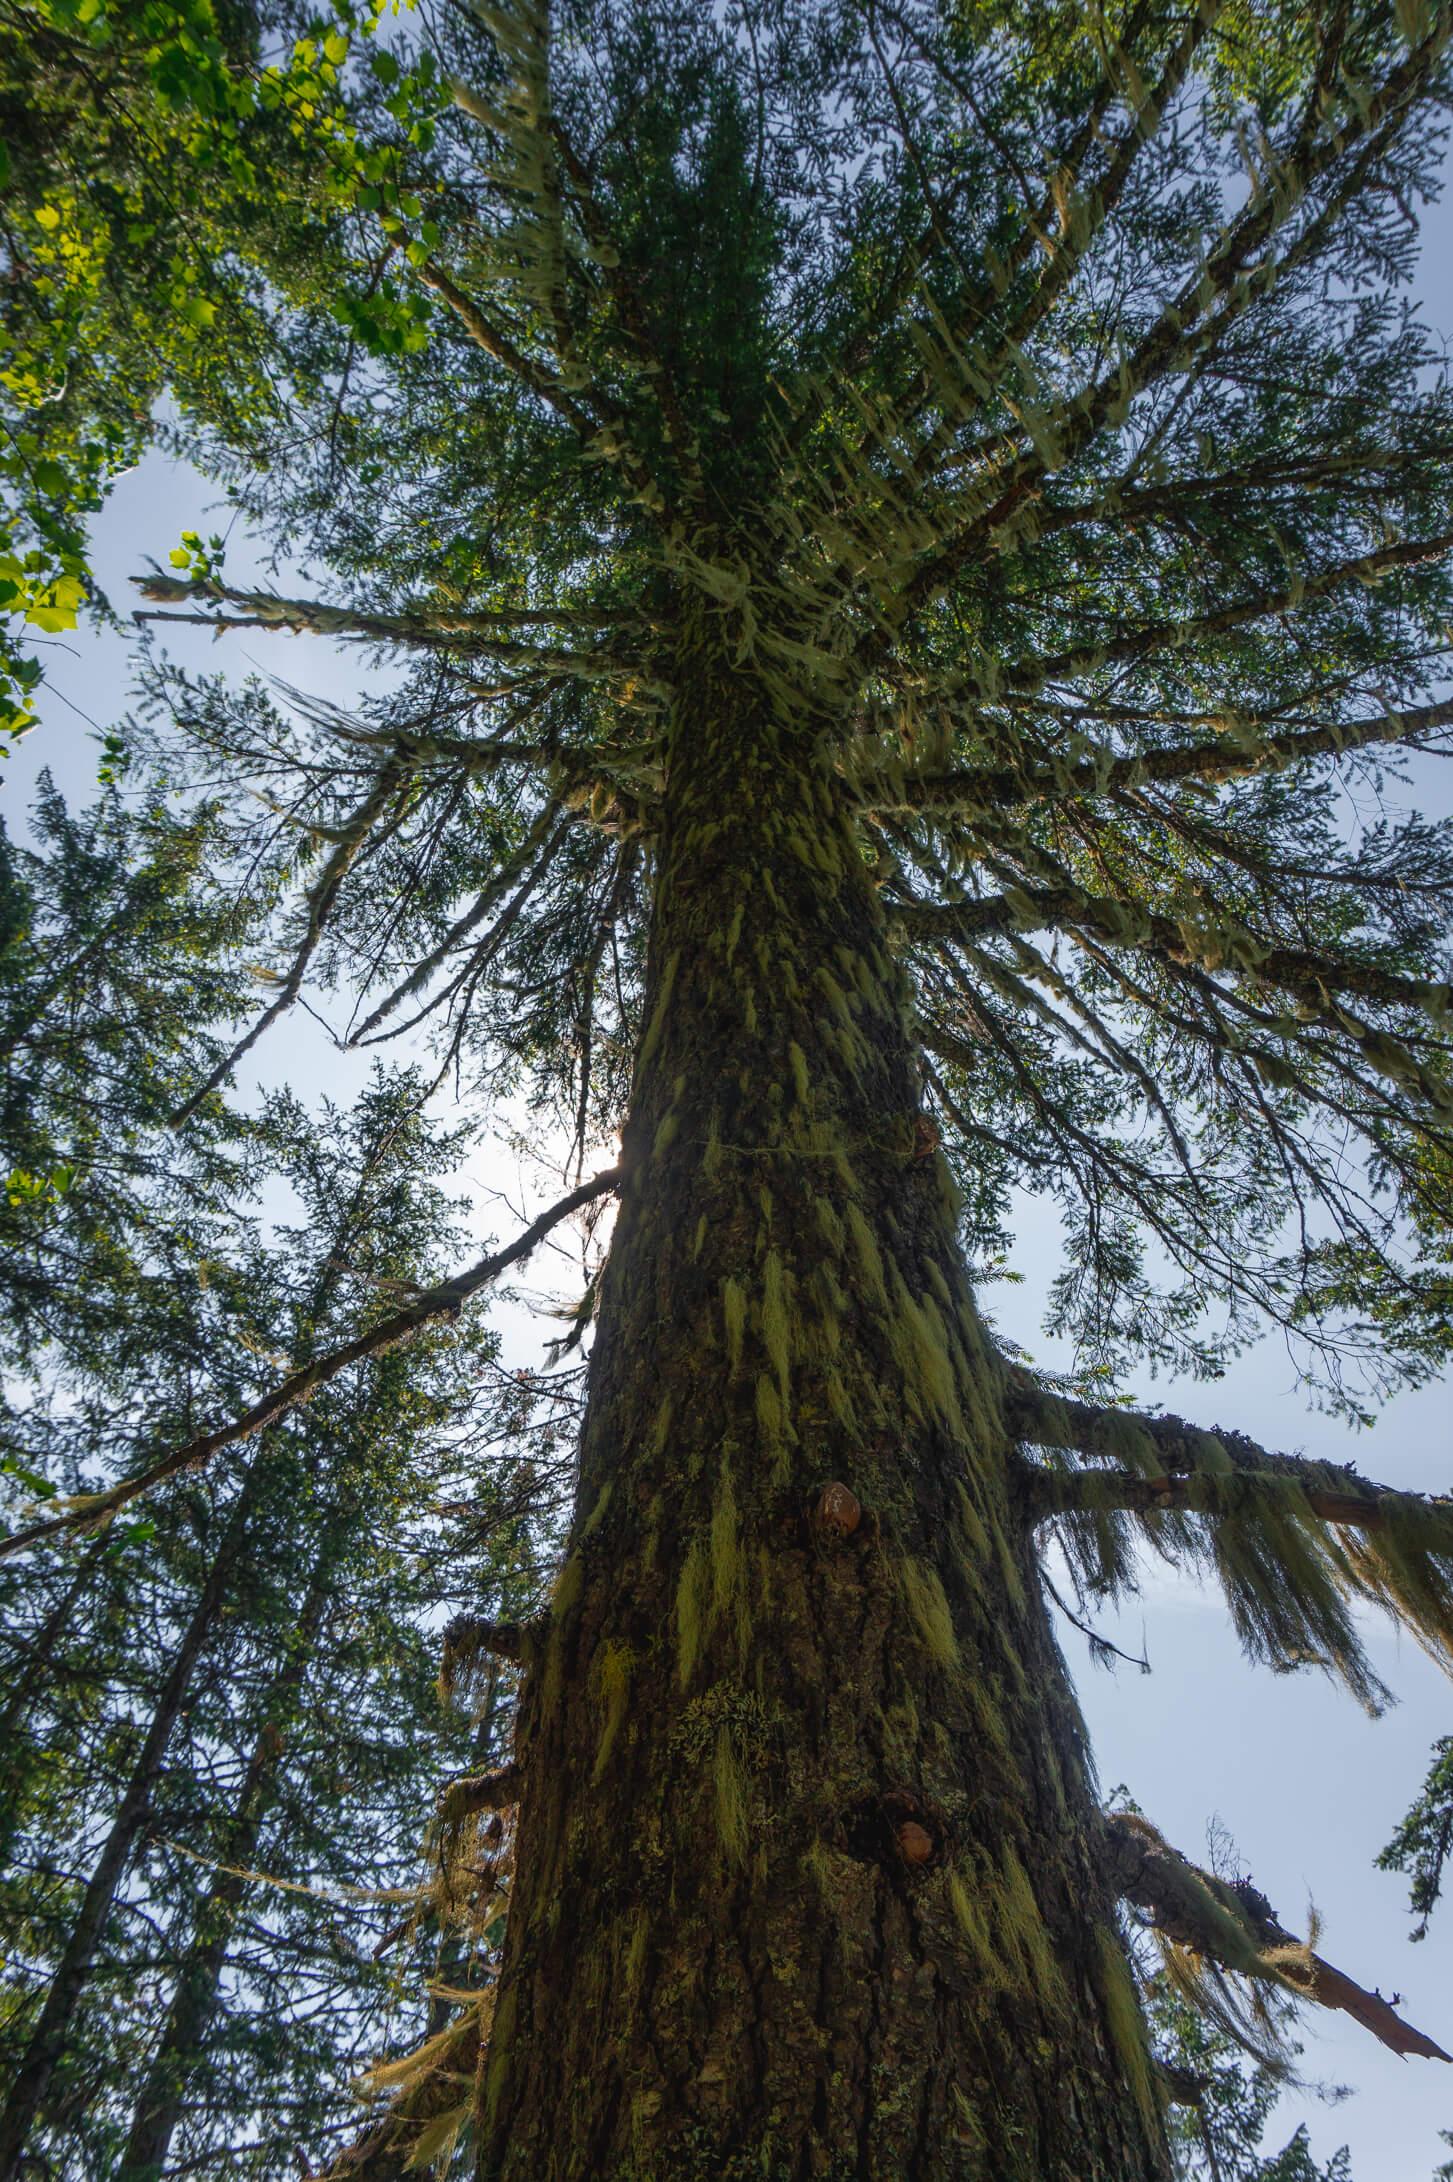 Moosbewachsener Baum am Broken Bridge Trail Revelstoke